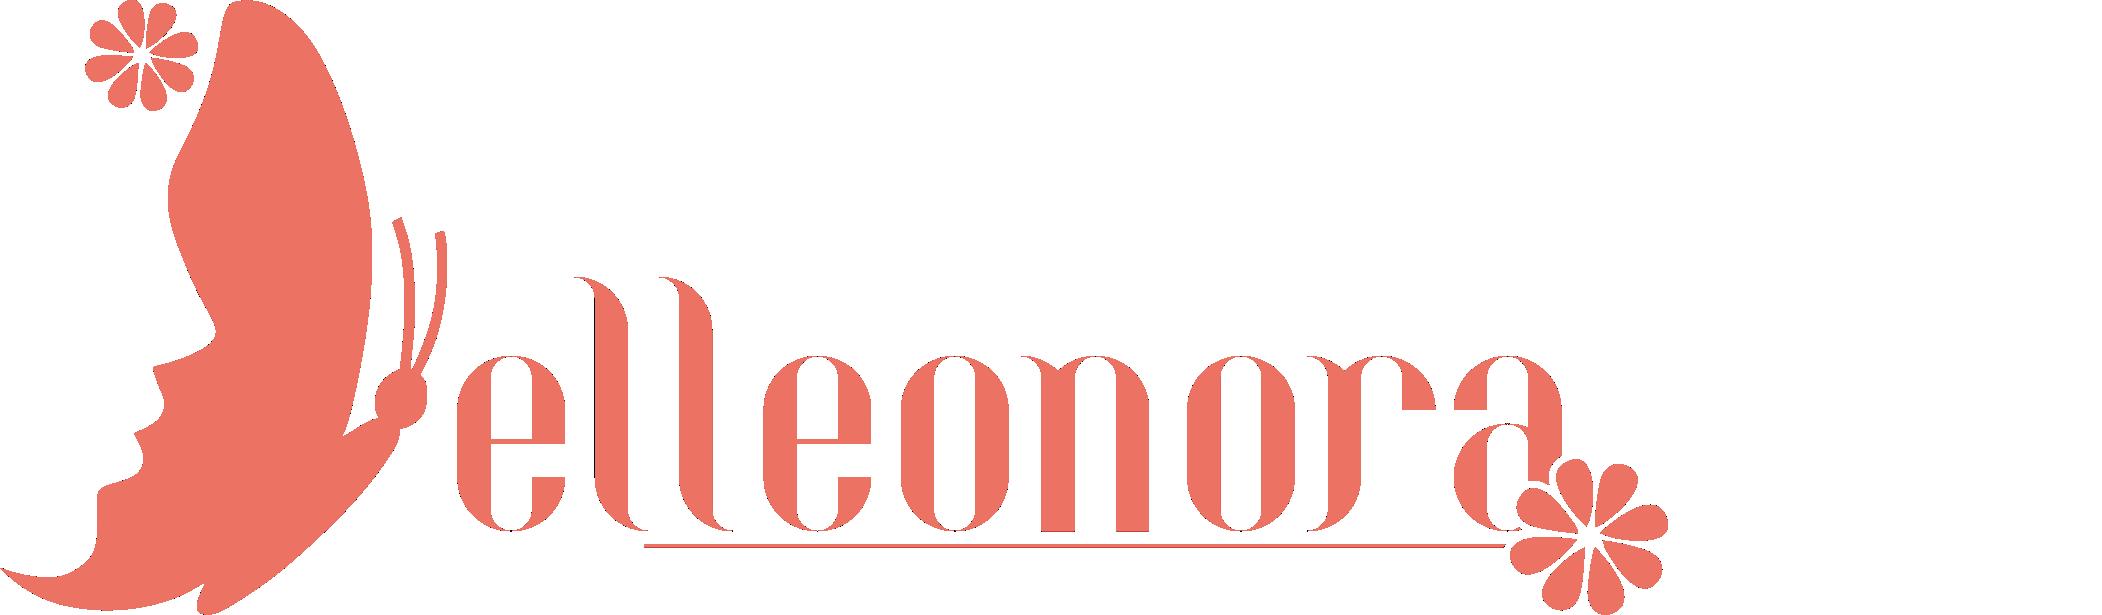 Логотип сайта Эллеонора